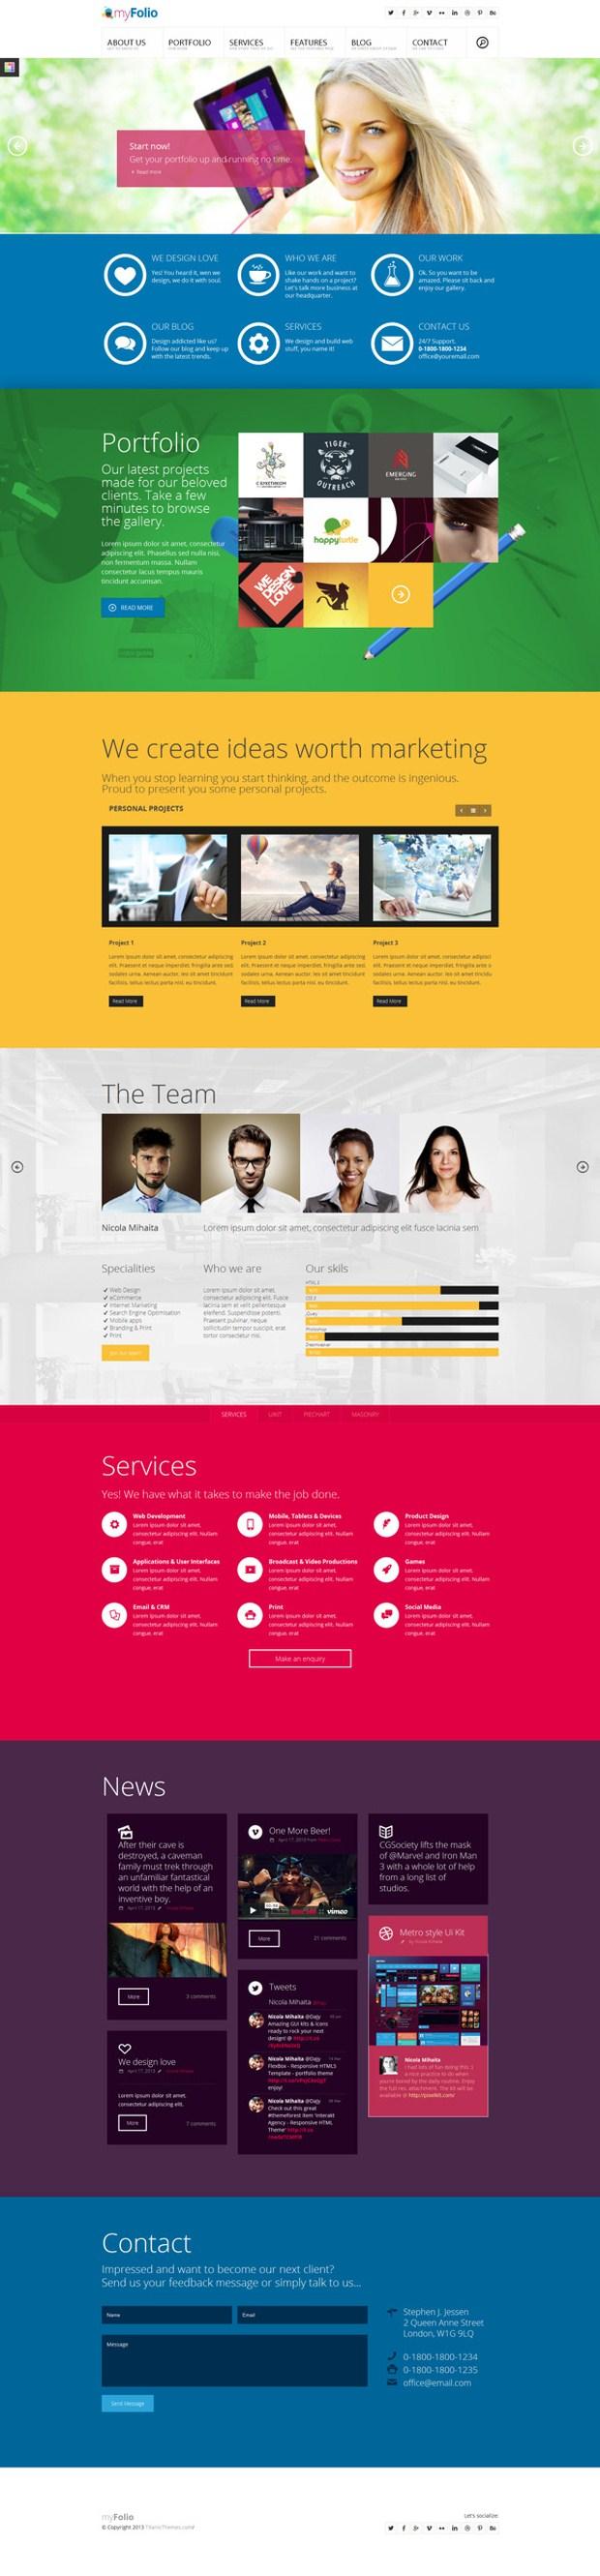 myFolio - Parallax HTML5 Template